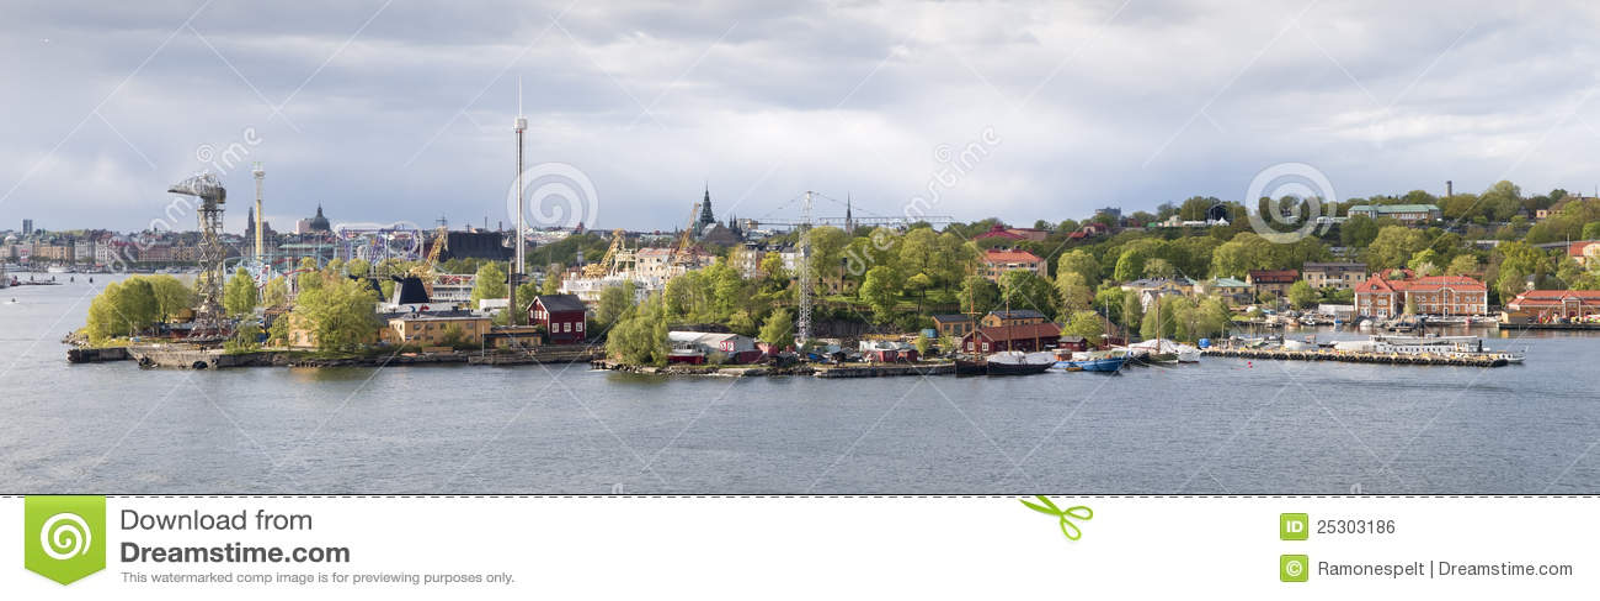 Parco di divertimenti Grona Lund, Stoccolma di vista